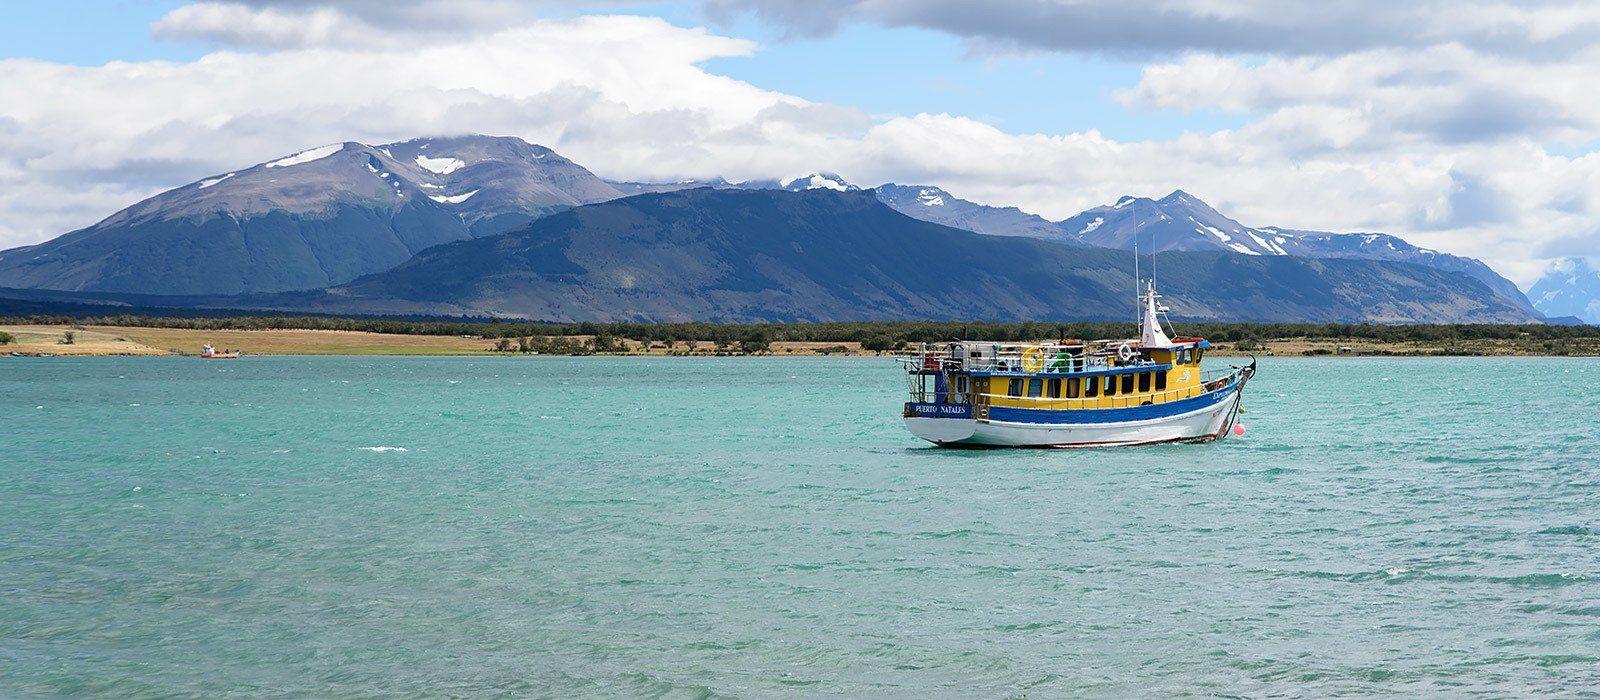 Reiseziel Puerto Natales Chile